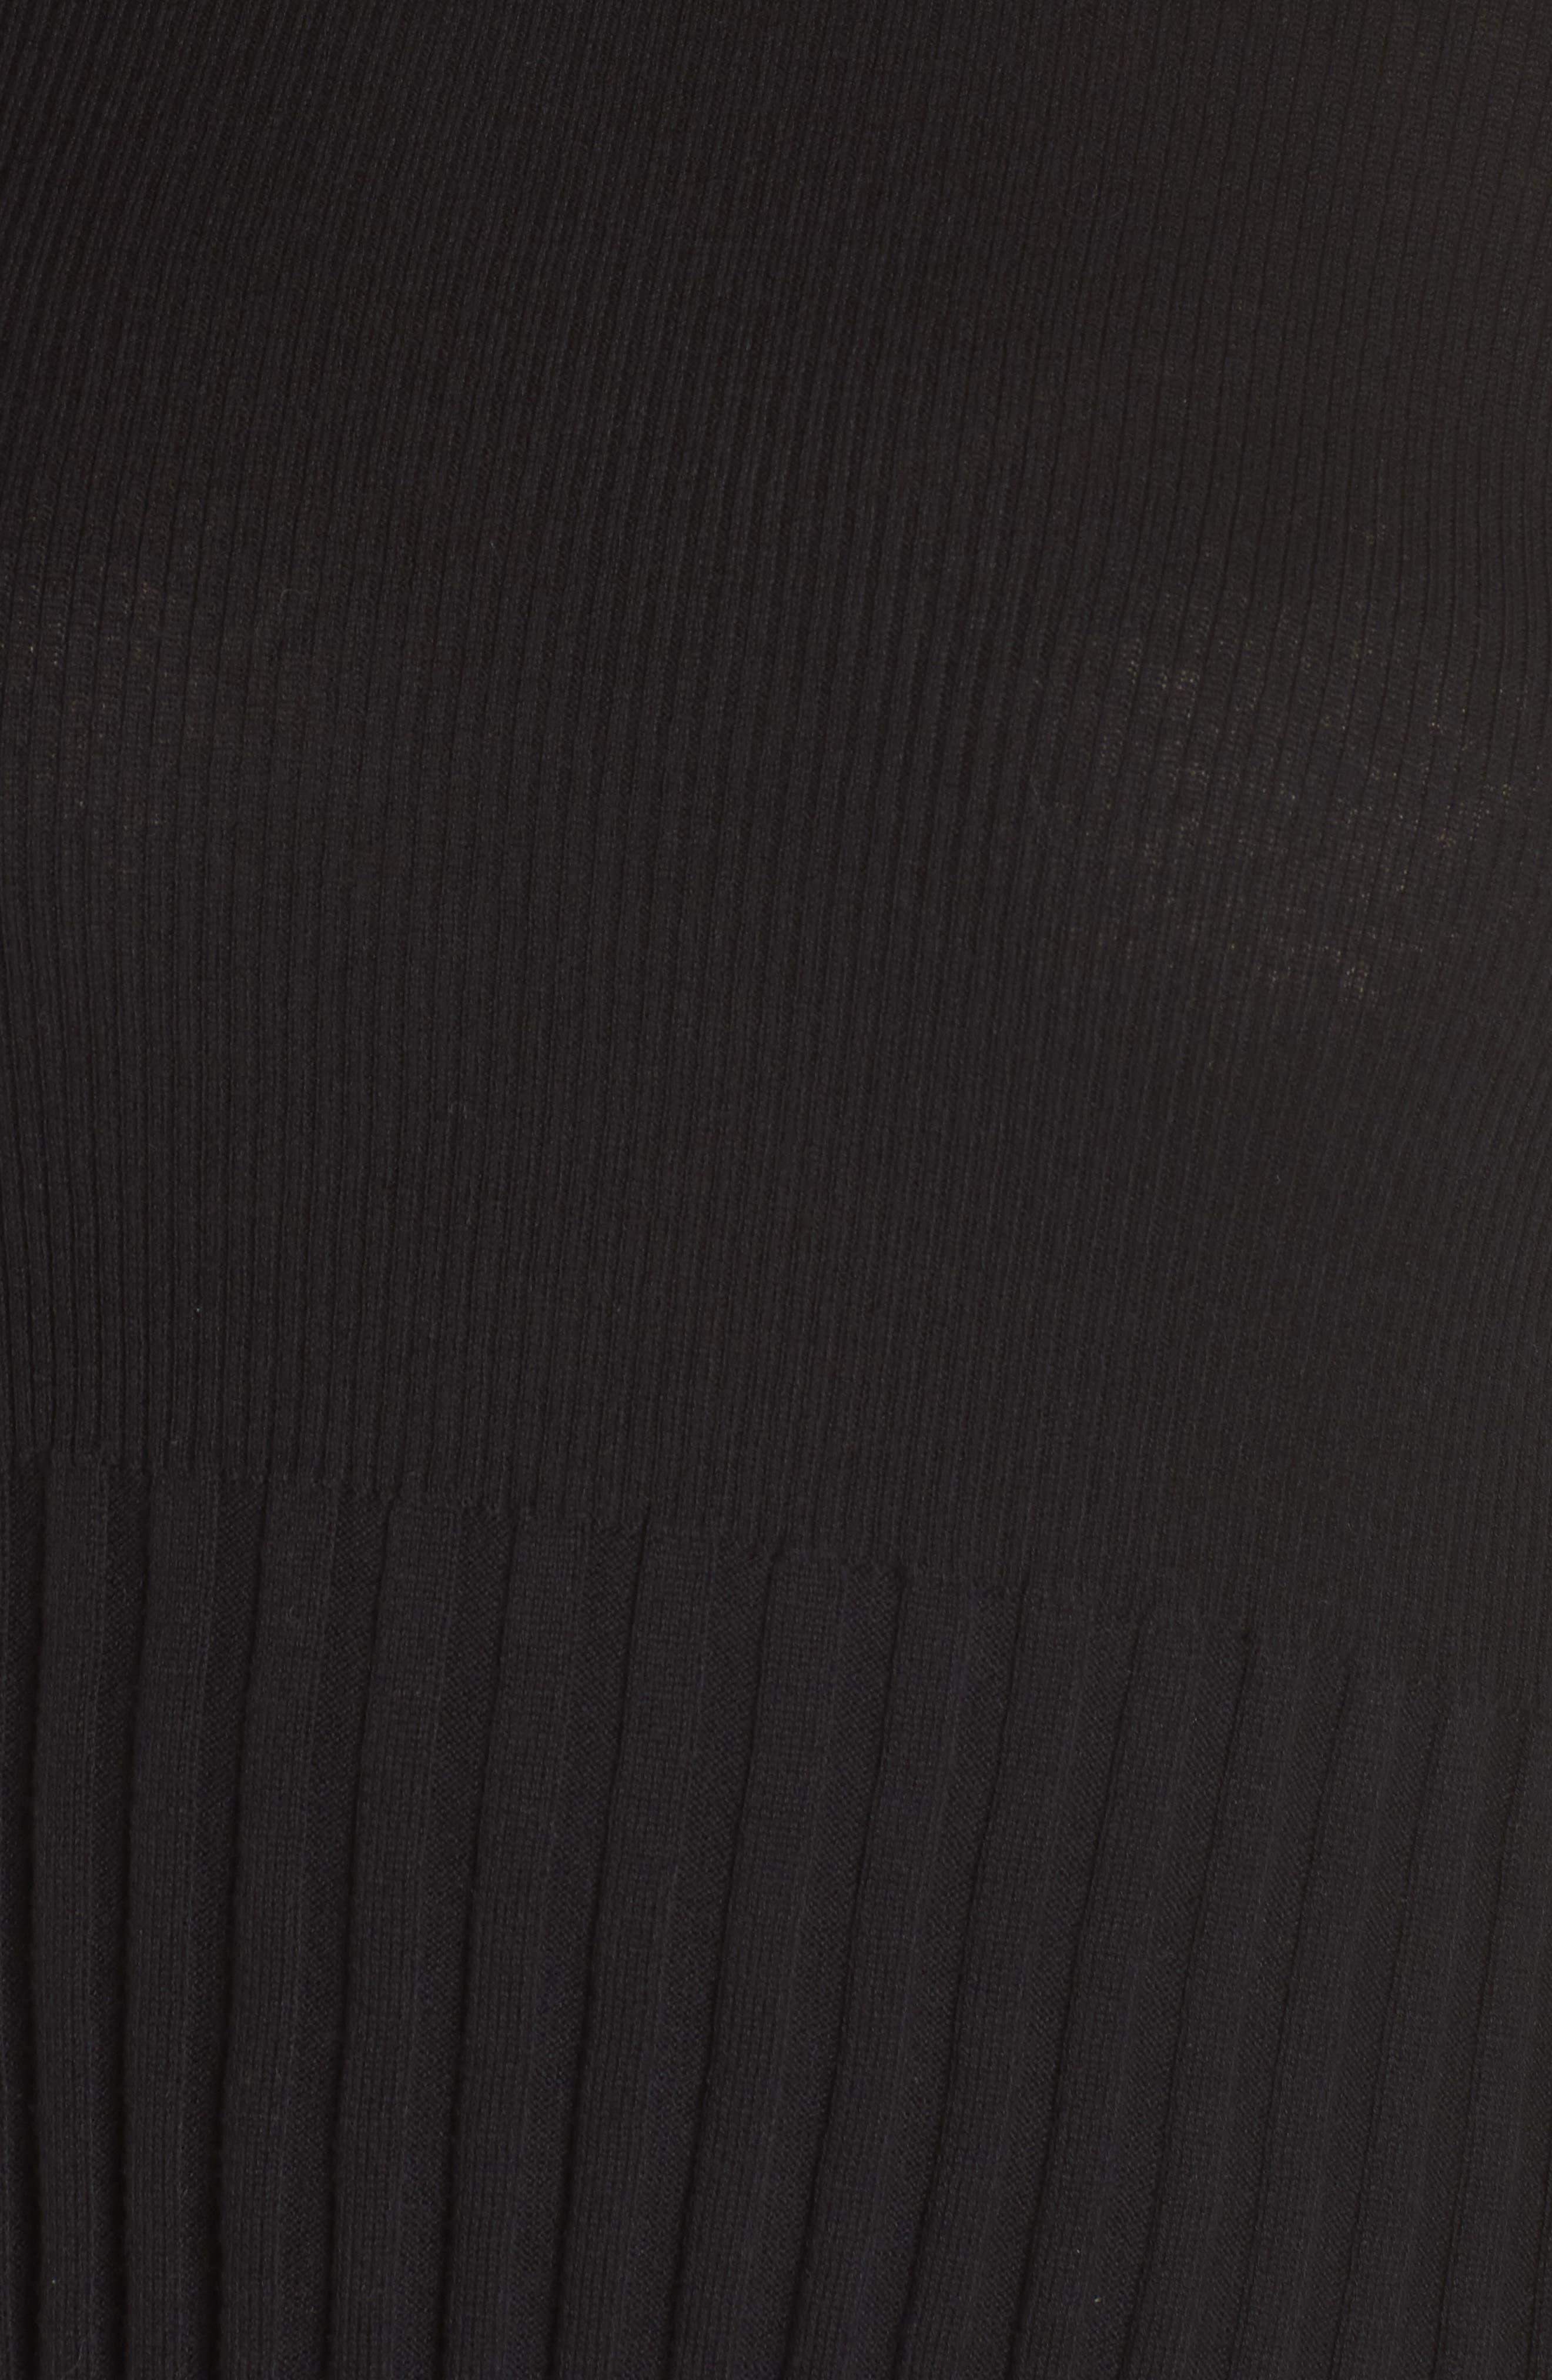 Ribbed Cotton Blend Sweater,                             Alternate thumbnail 6, color,                             Black